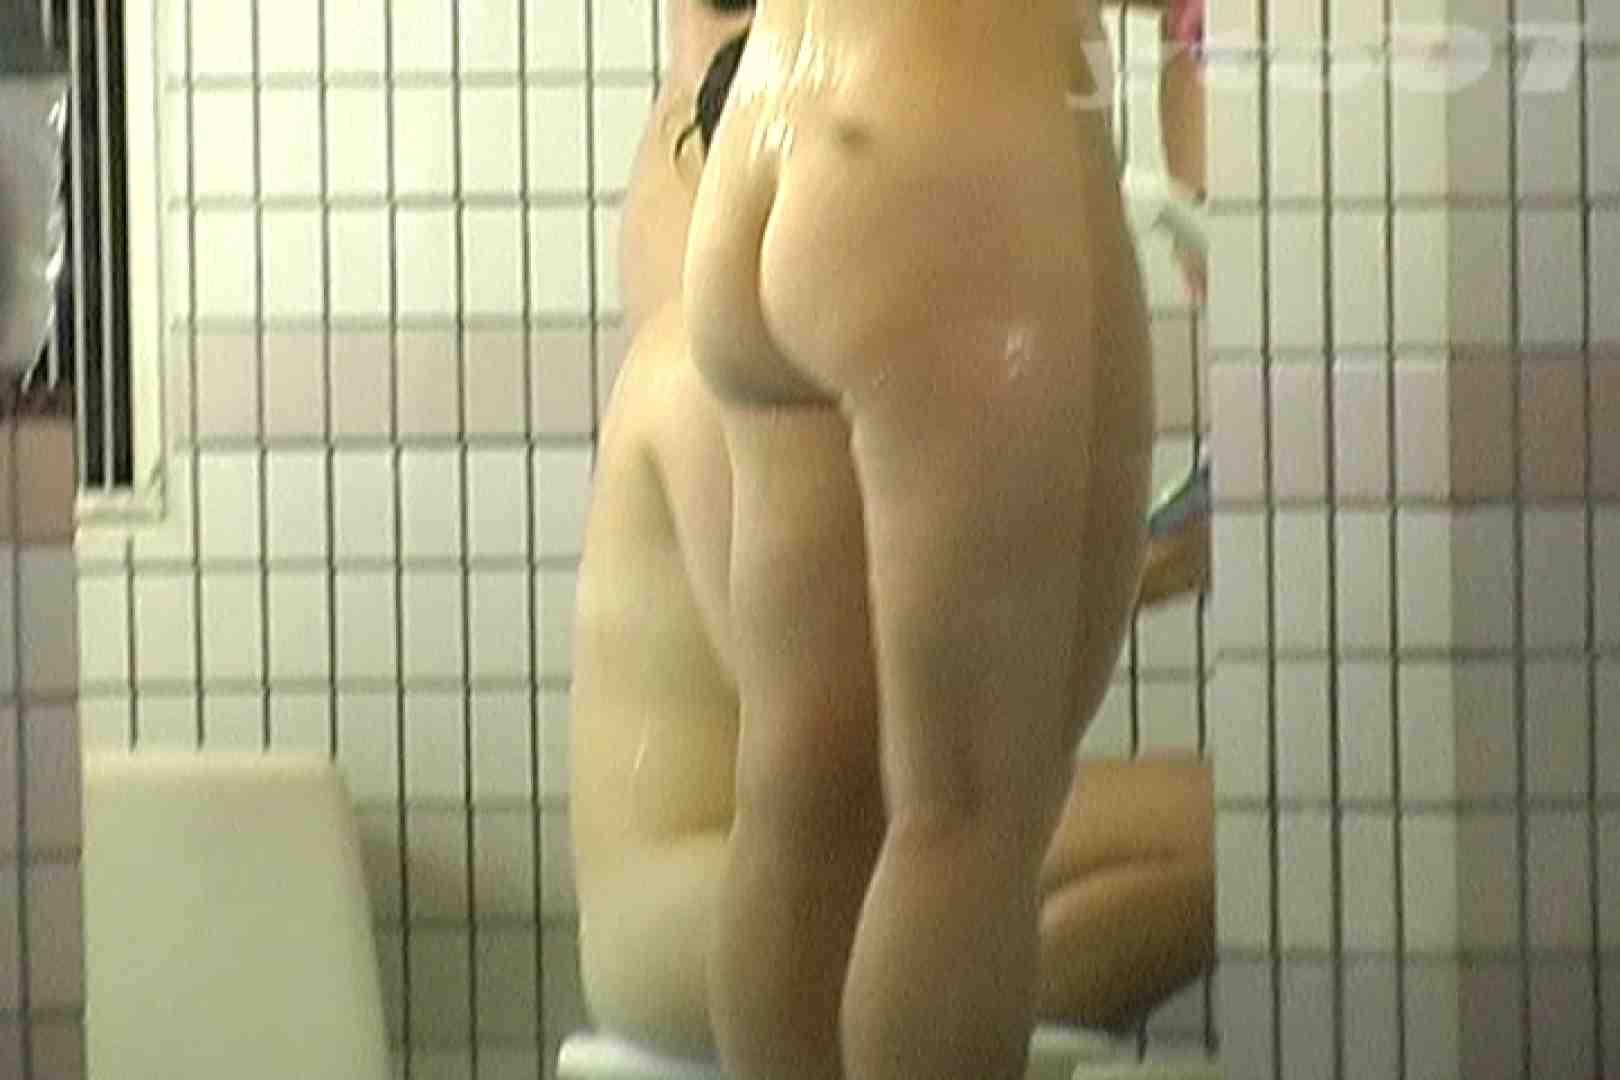 ▲復活限定▲合宿ホテル女風呂盗撮 Vol.08 女風呂 セックス無修正動画無料 83画像 38